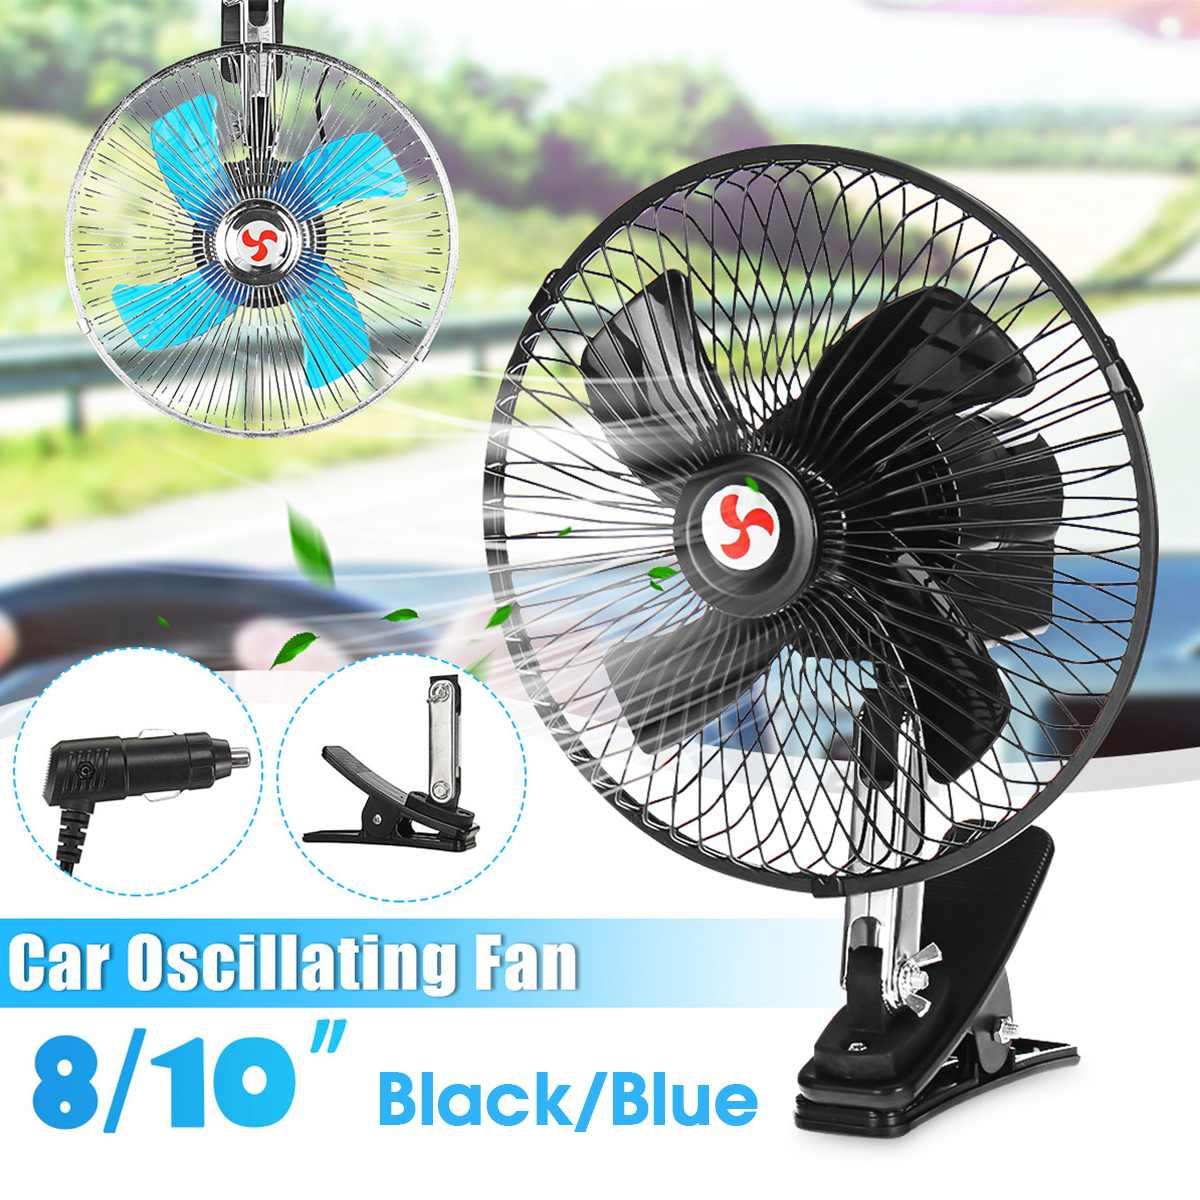 12V/24V Car Fan Dashboard Oscillating Electric Air Cooler Cooling Fans Clip-On Fan For RV Van Truck Home Computer